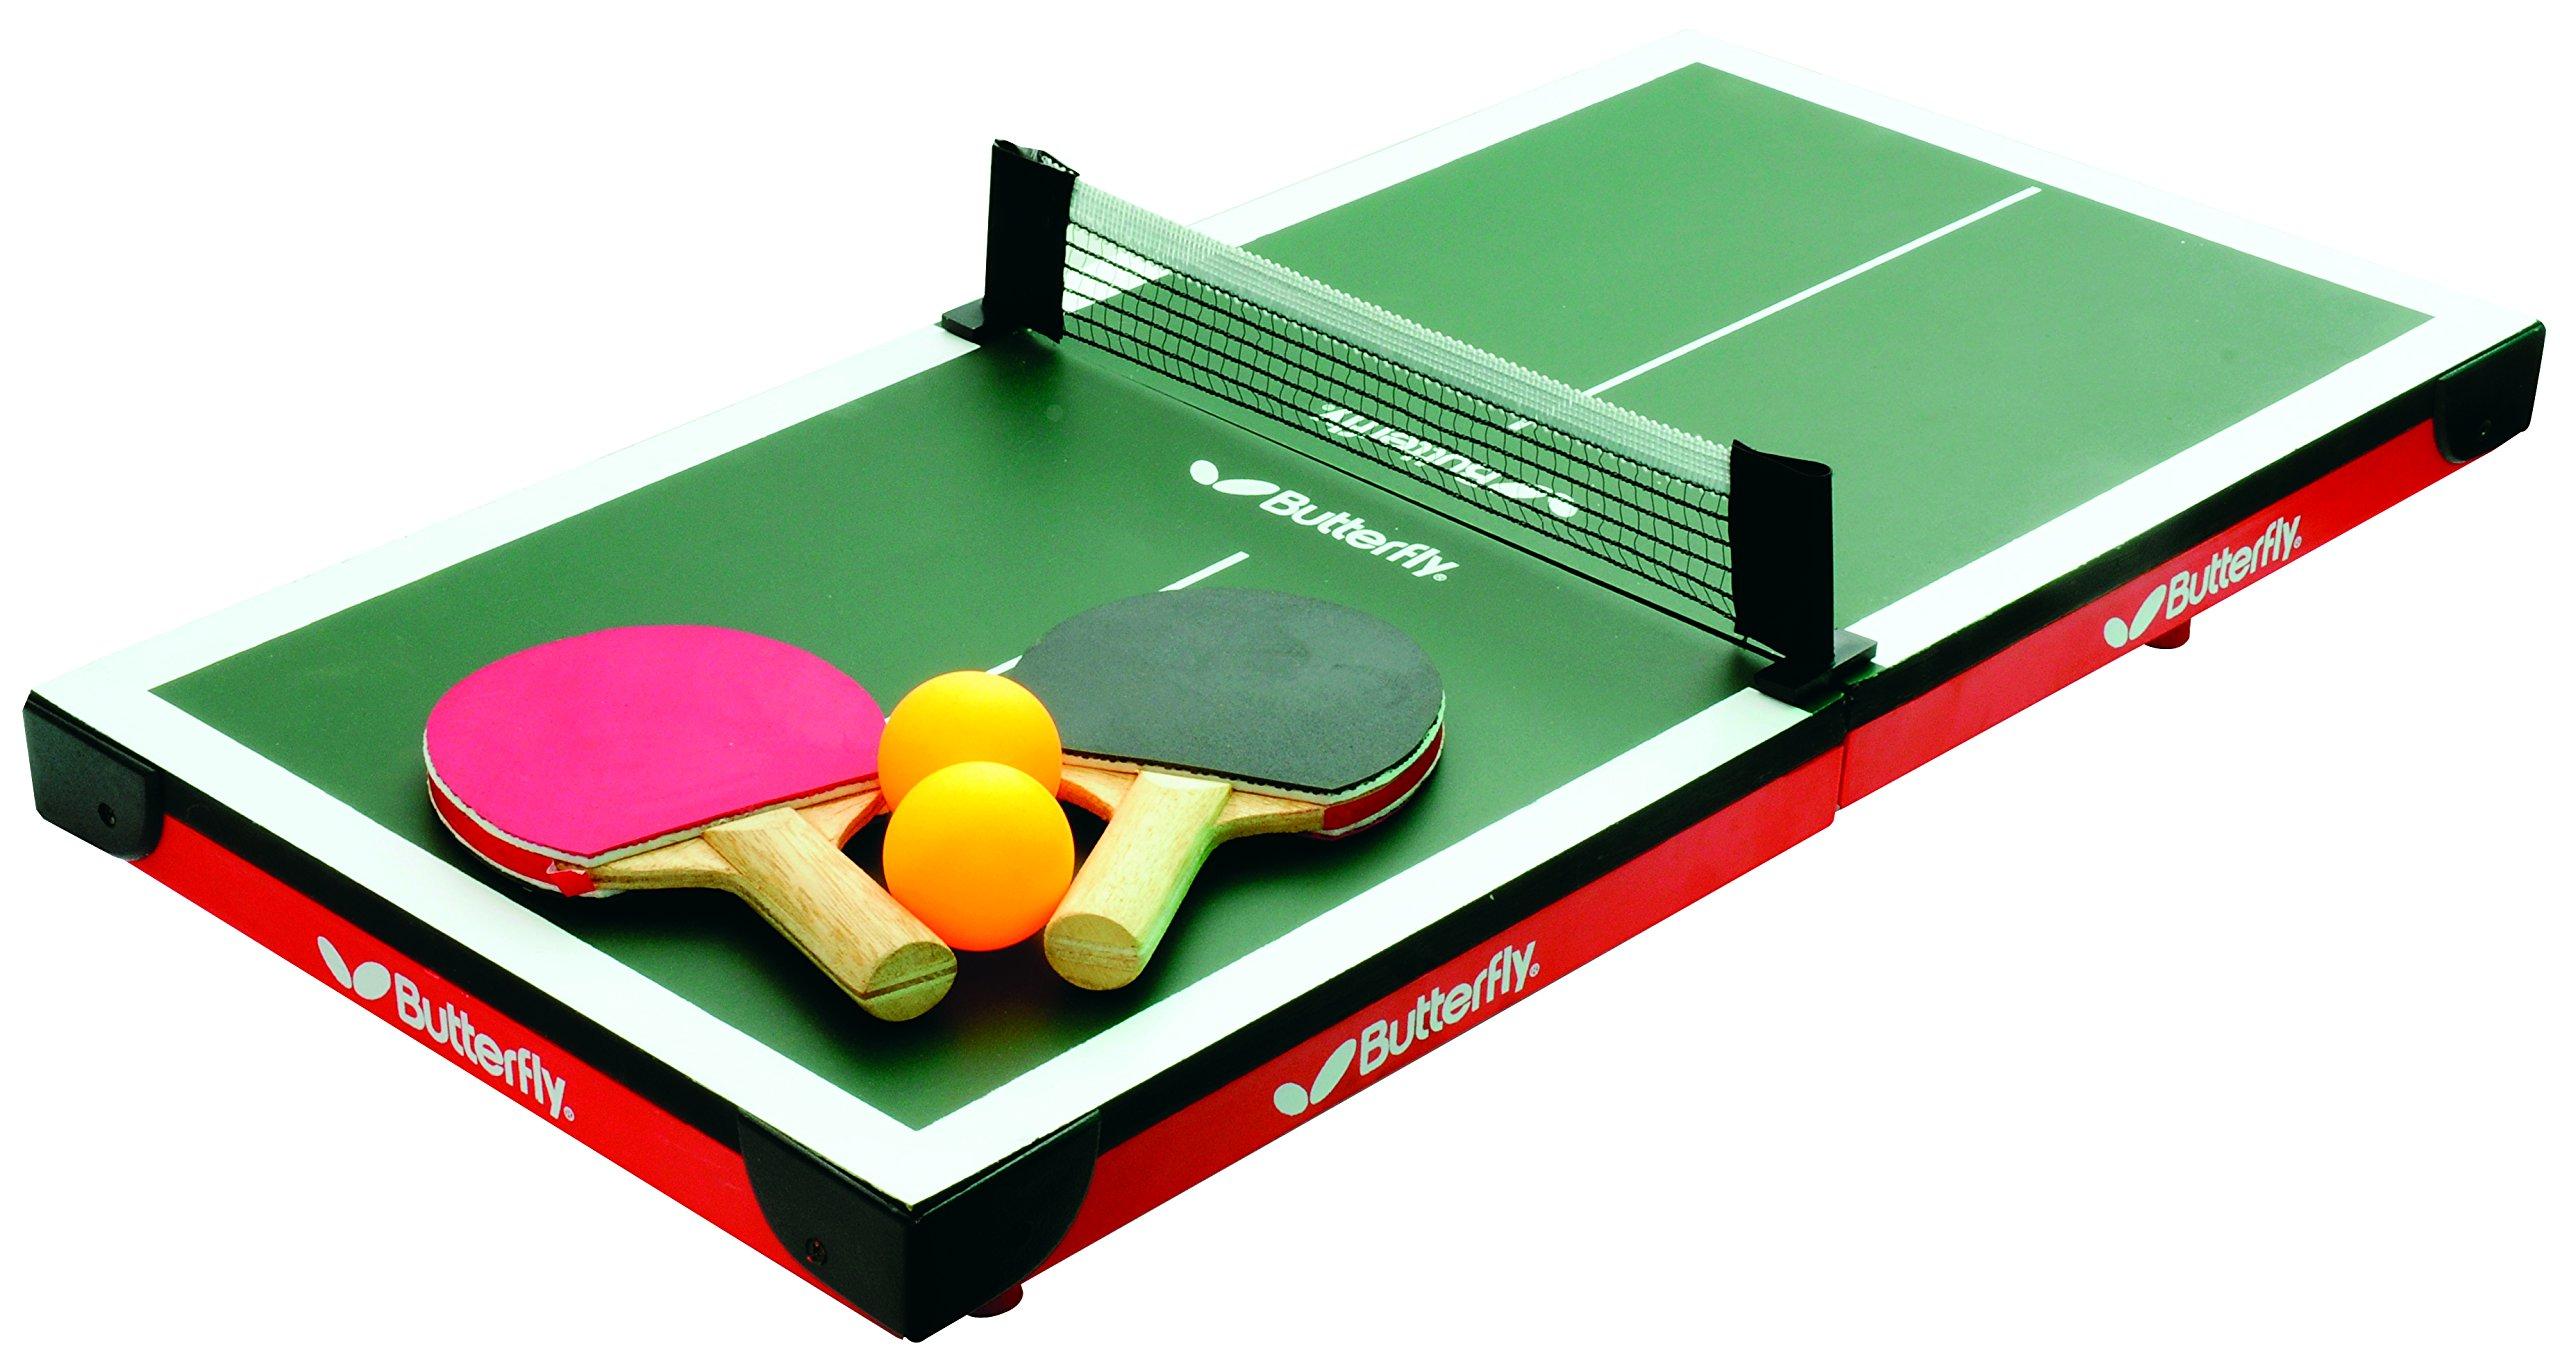 Butterfly Mini Table - Mesa de ping pong: Amazon.es: Deportes y aire libre